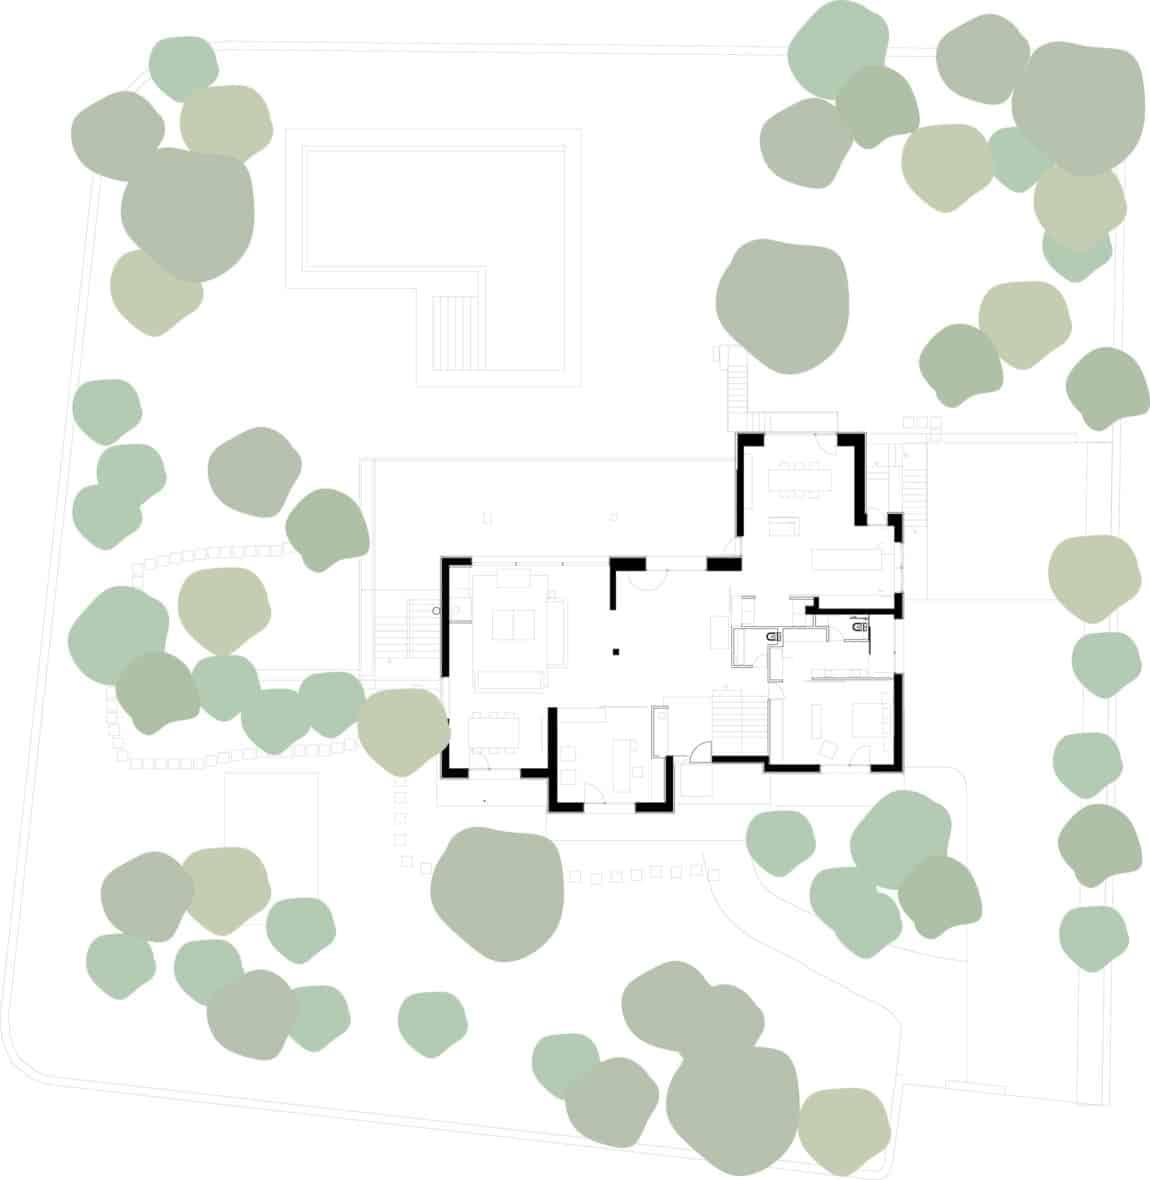 La Moraleja by ÁBATON Arquitectura (33)